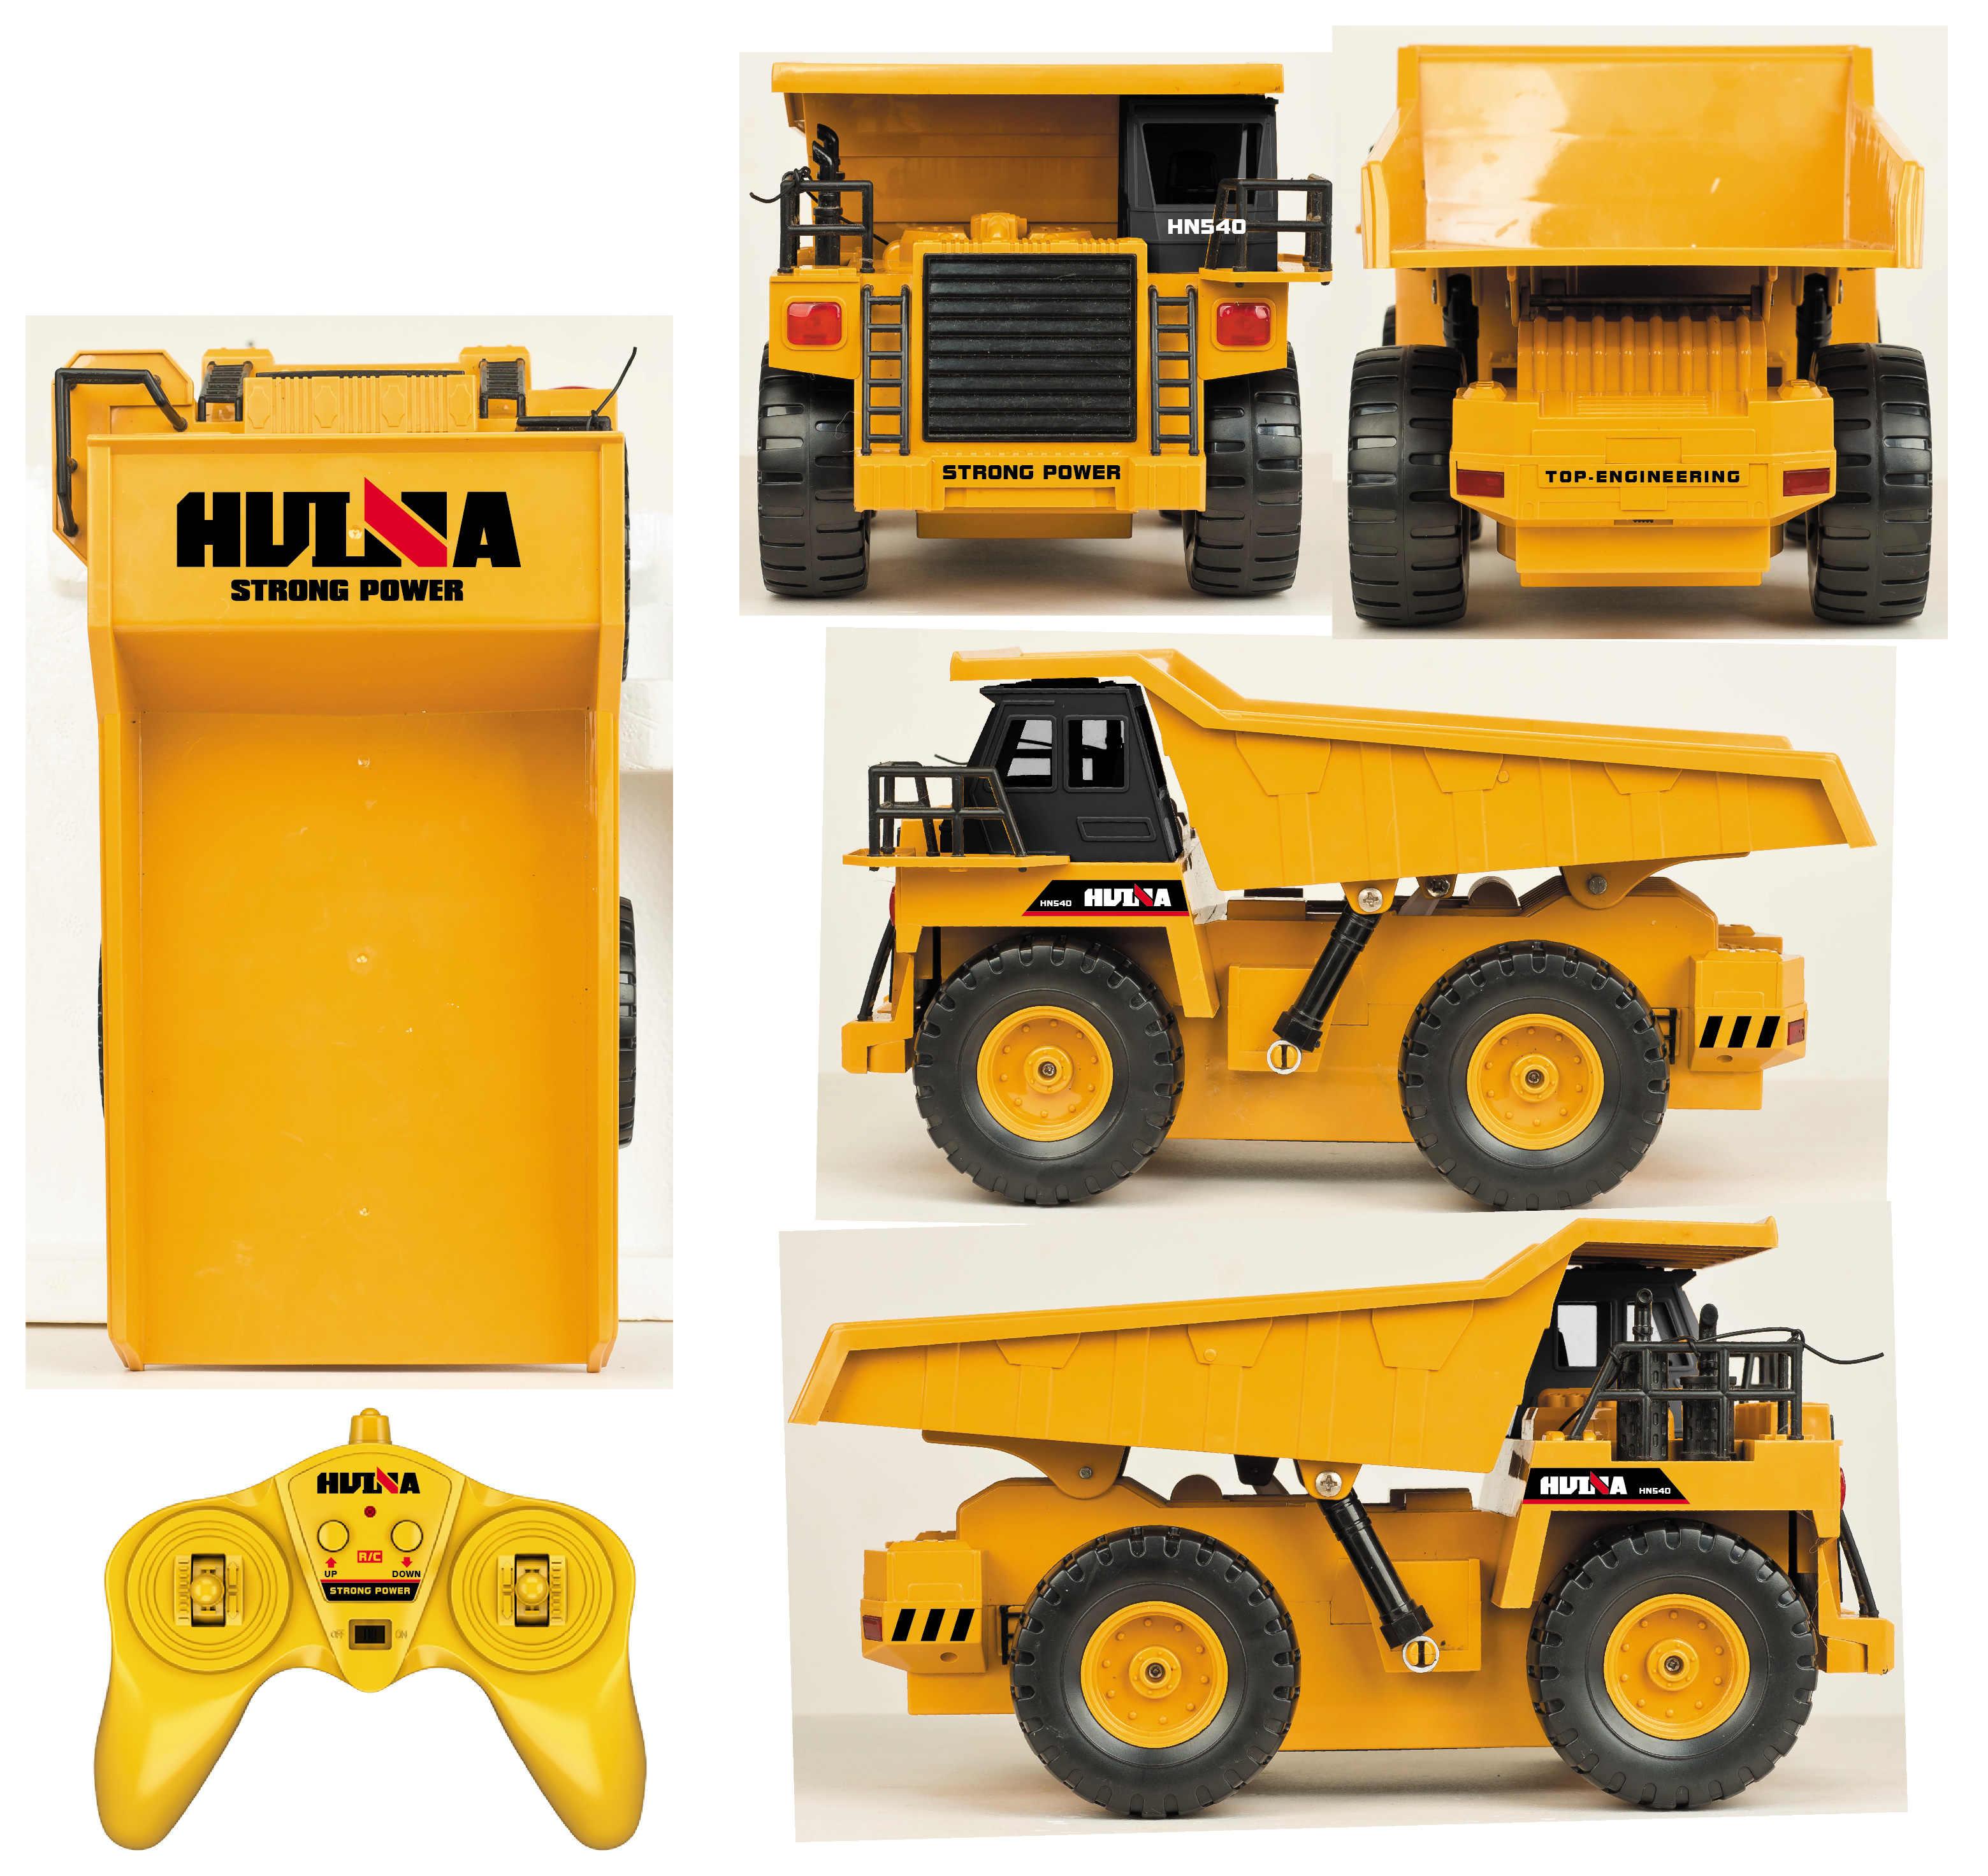 1/18 Huina 1540 Rc Dump Lkw Fernbedienung Bagger Spielzeug Legierung RC Modell Spielzeug Engineering Fahrzeug Kinder Autos